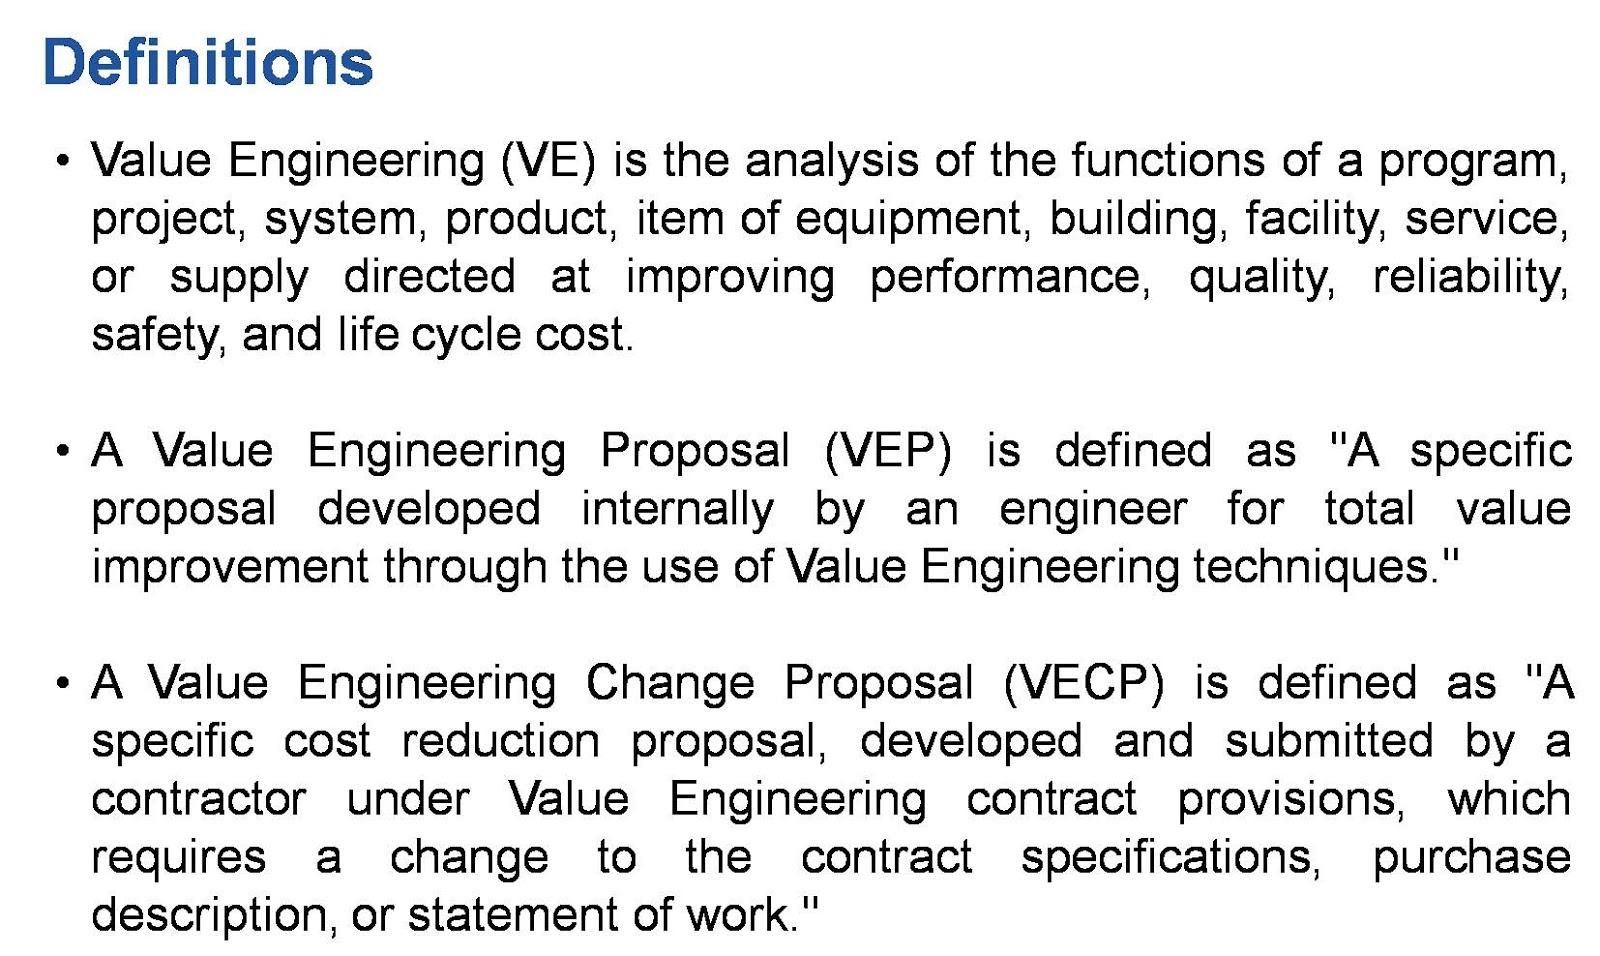 Bhupesh Sharma Va Ve In Automotive Wiring Harness Program